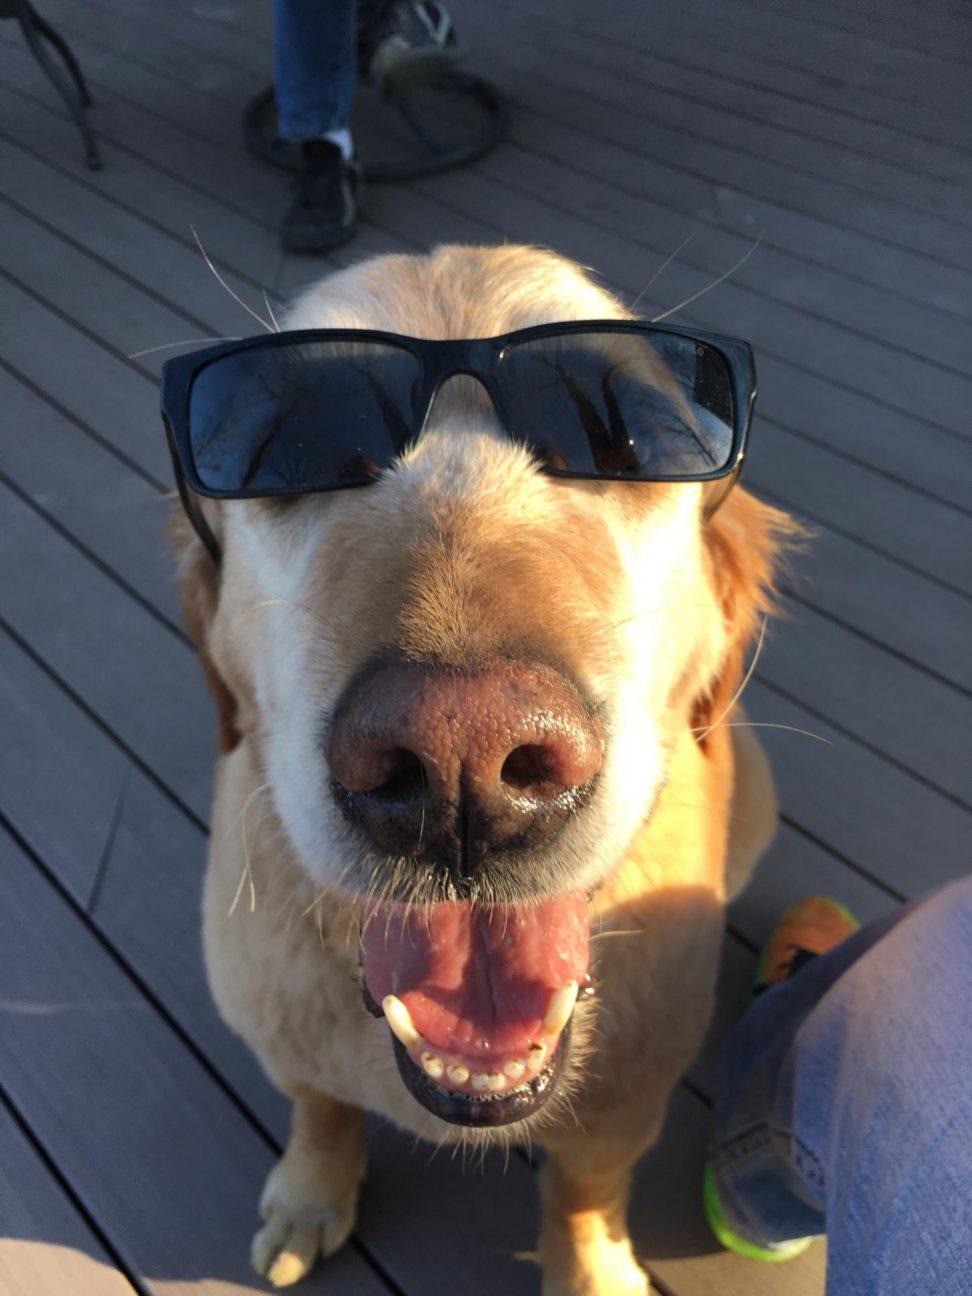 PetCure Pet Hero Mark the Lovable Golden Retriever and cancer survivor